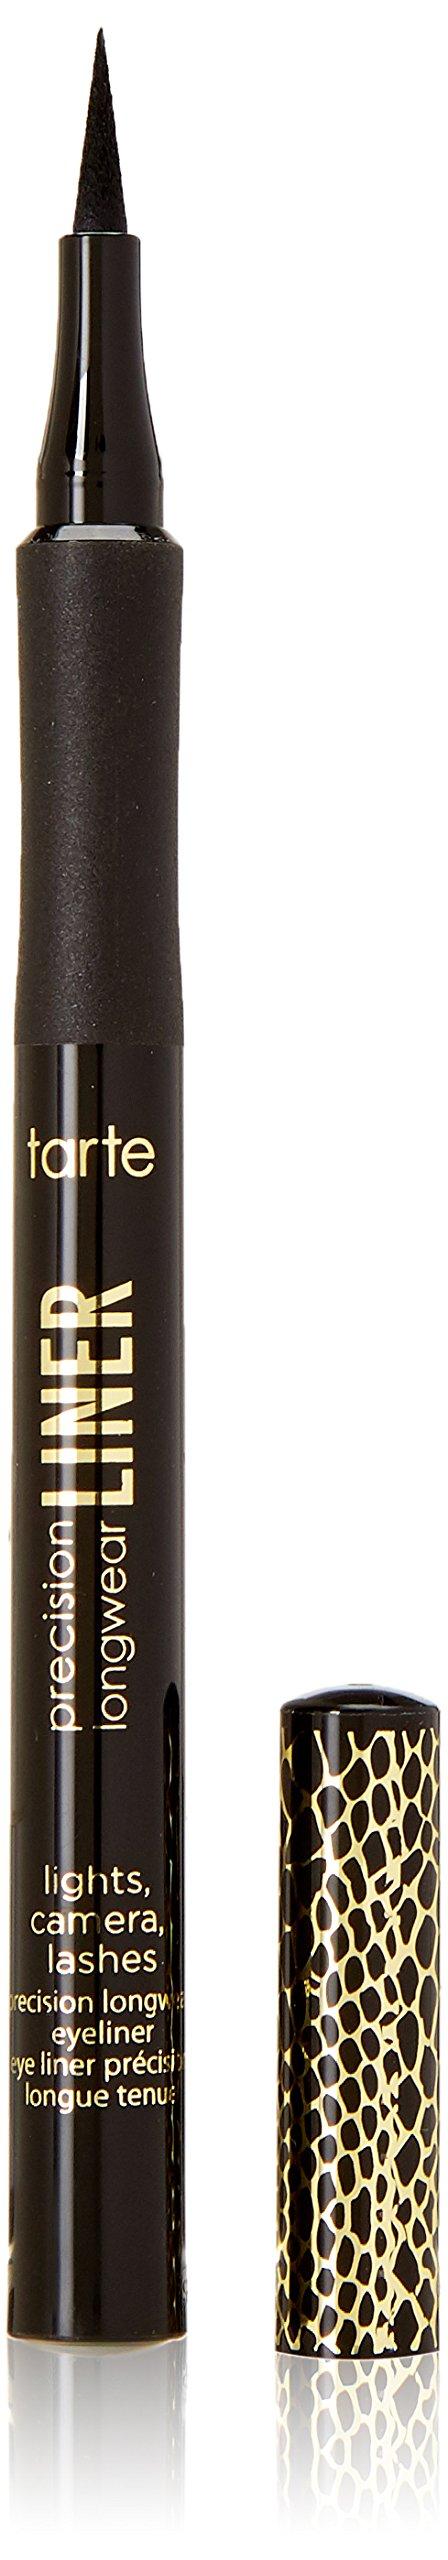 tarte Lights, Camera Lashes Precision Longwear Eyeliner in Black 0.034 FL OZ